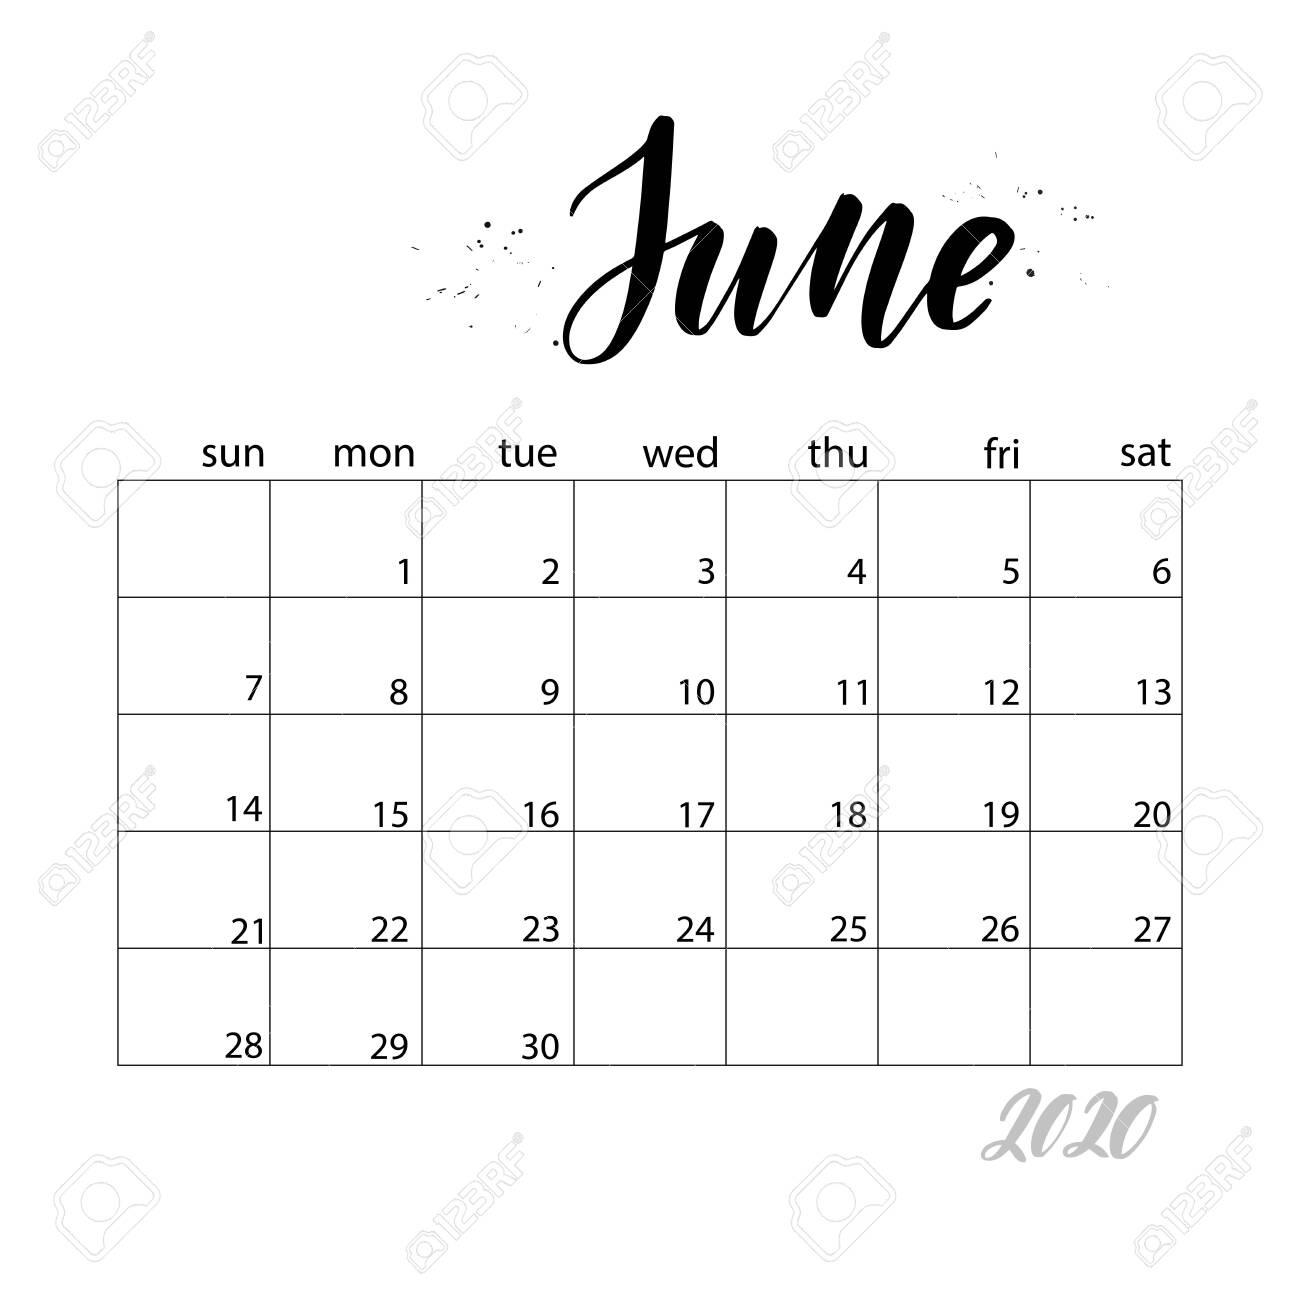 June. Monthly Calendar For 2020 Year. Handwritten Modern Calligraphy..